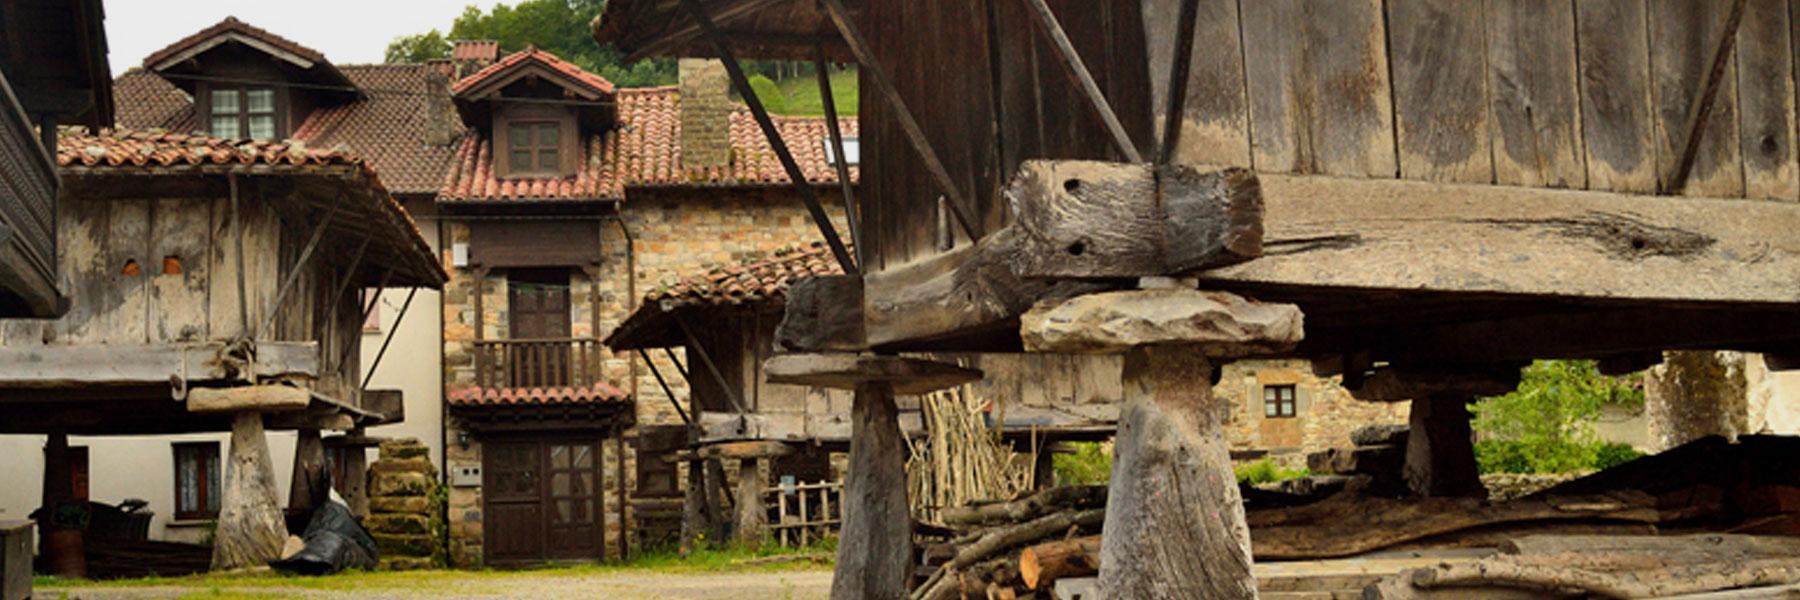 Viaje fin de curso Cantabria